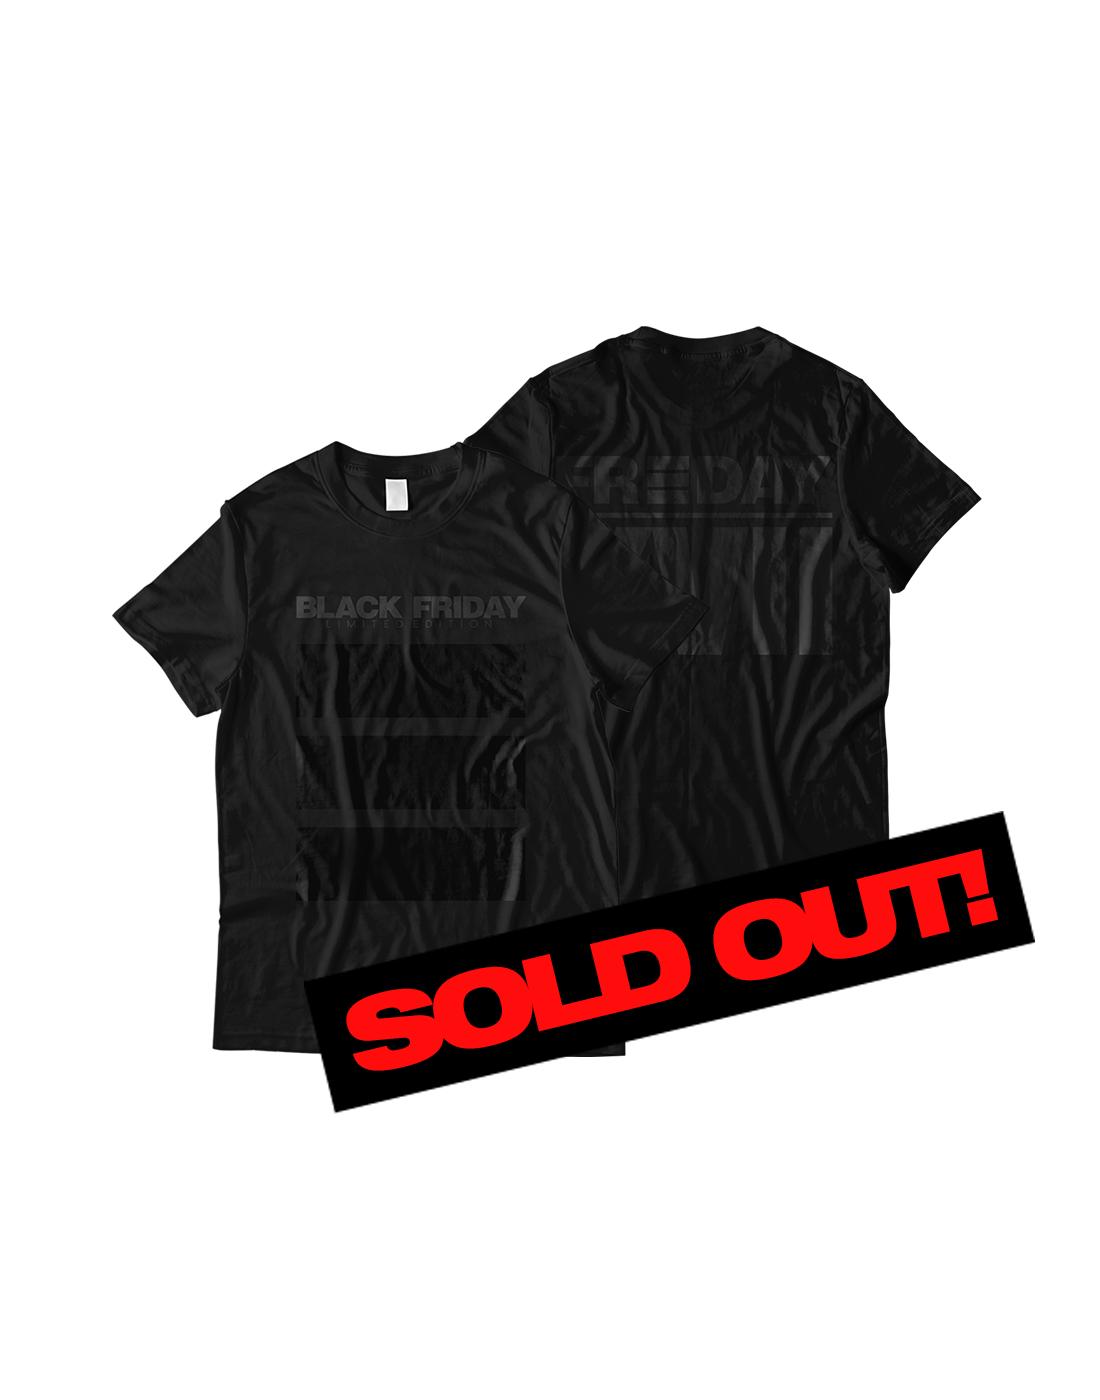 Black Friday Shirt All Black